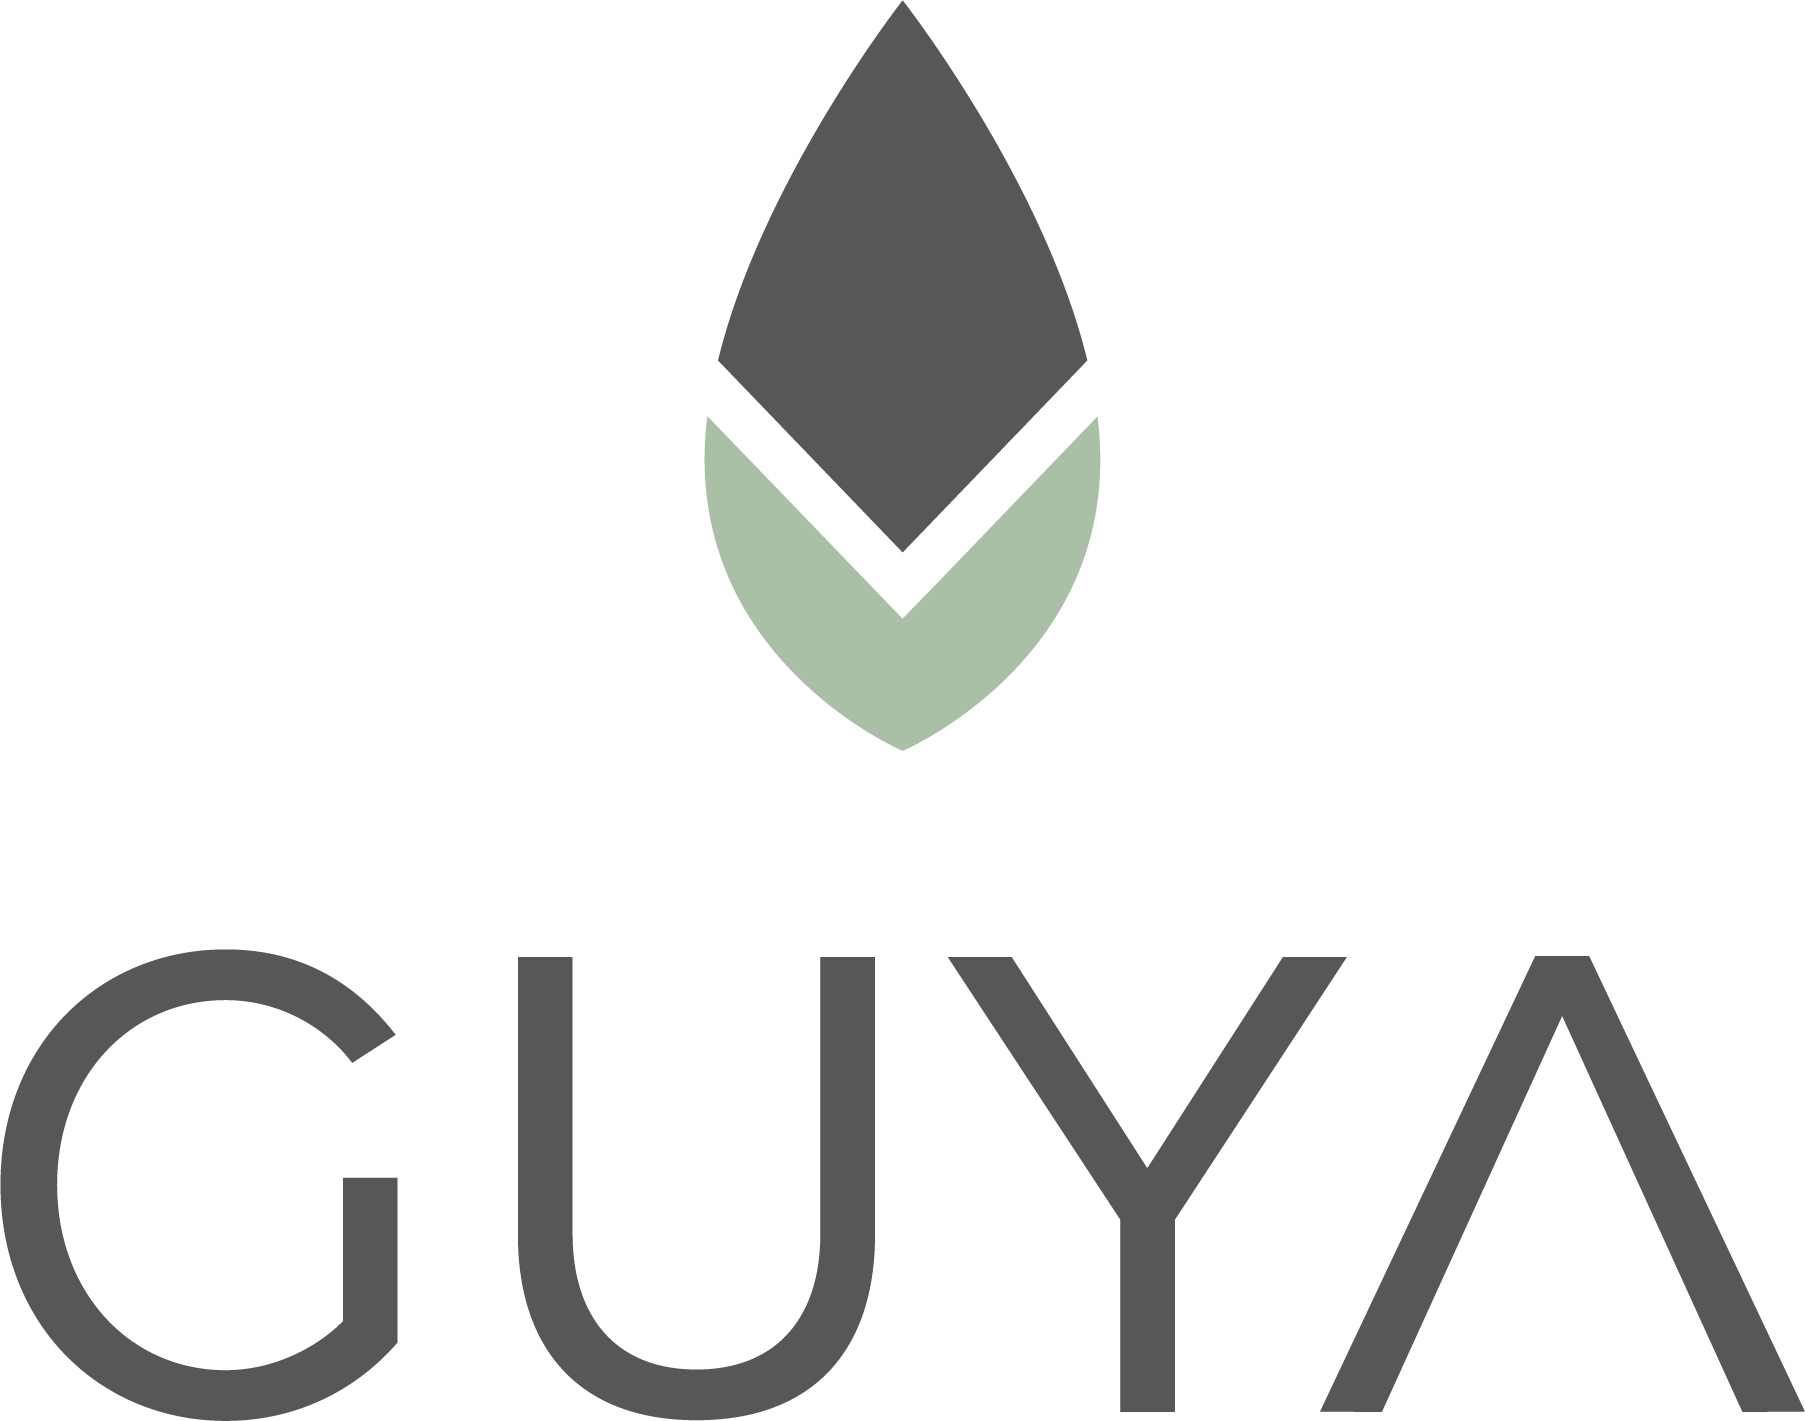 GUYA Guayusa - DrinkGUYA